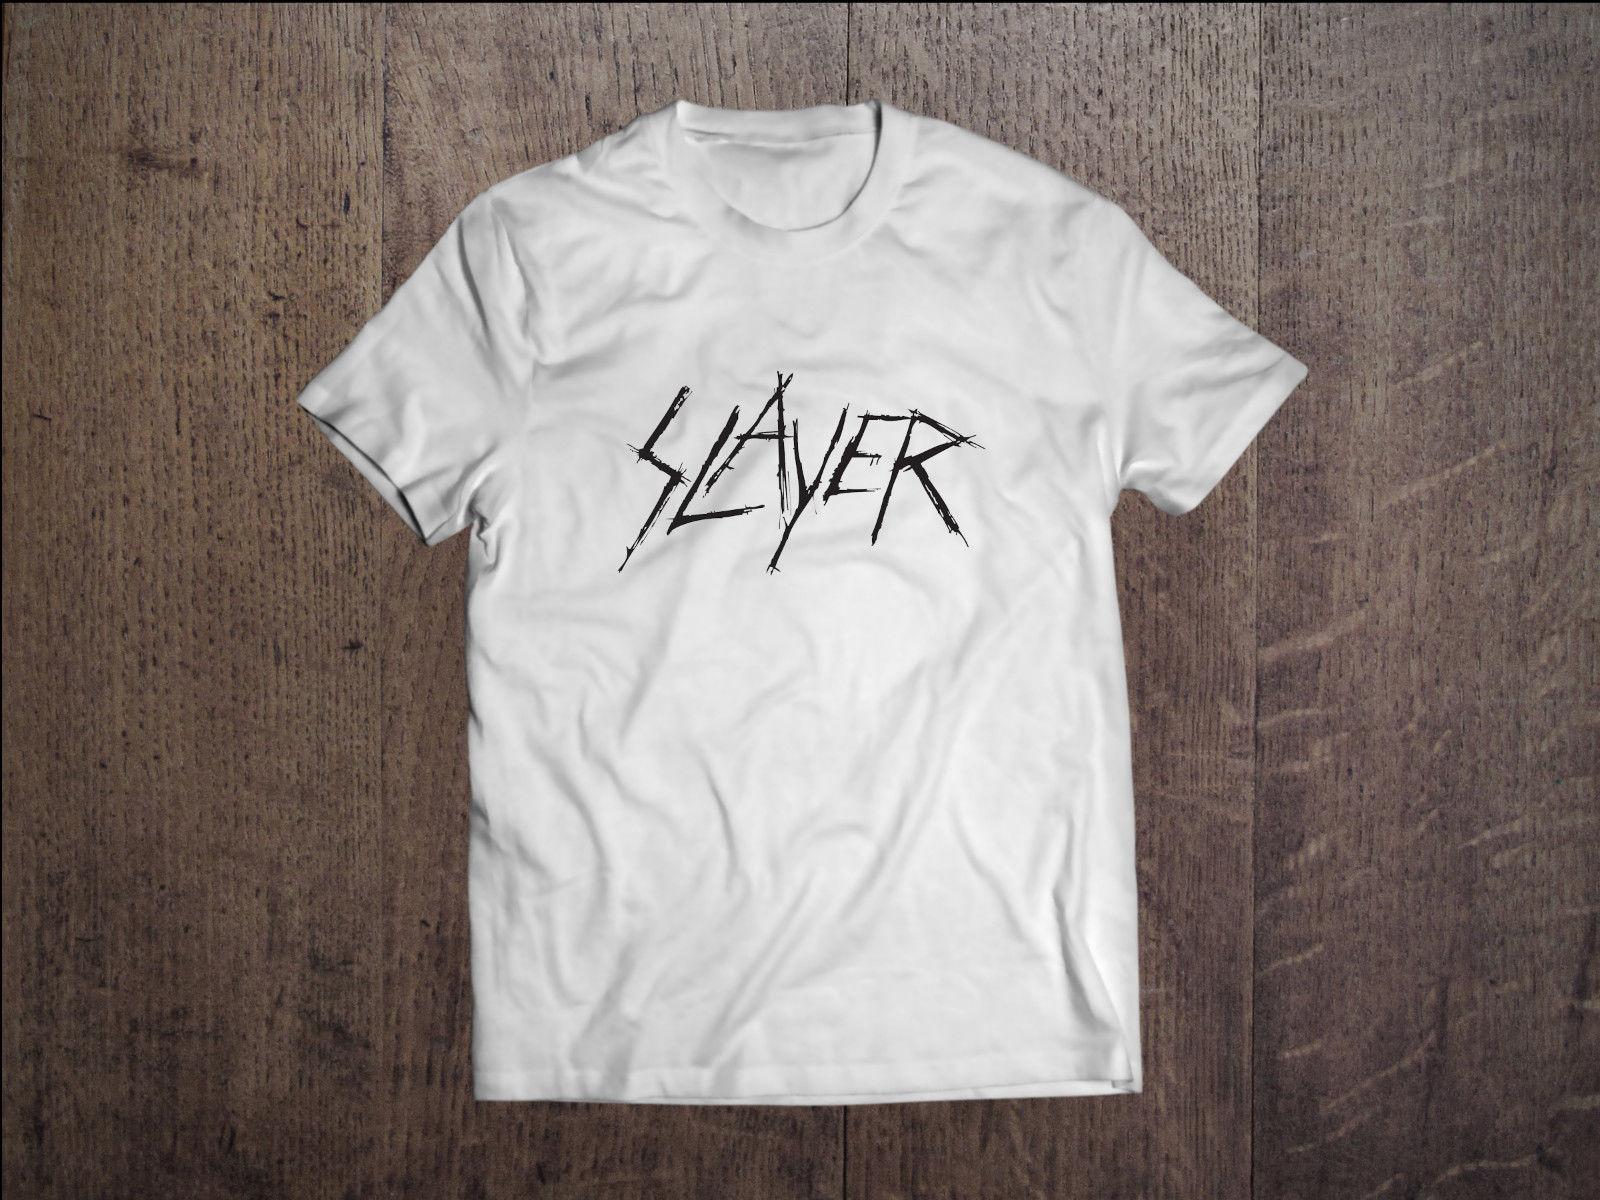 Slayer graphic men logo t shirt white rock band fan tee for Xxl band t shirts